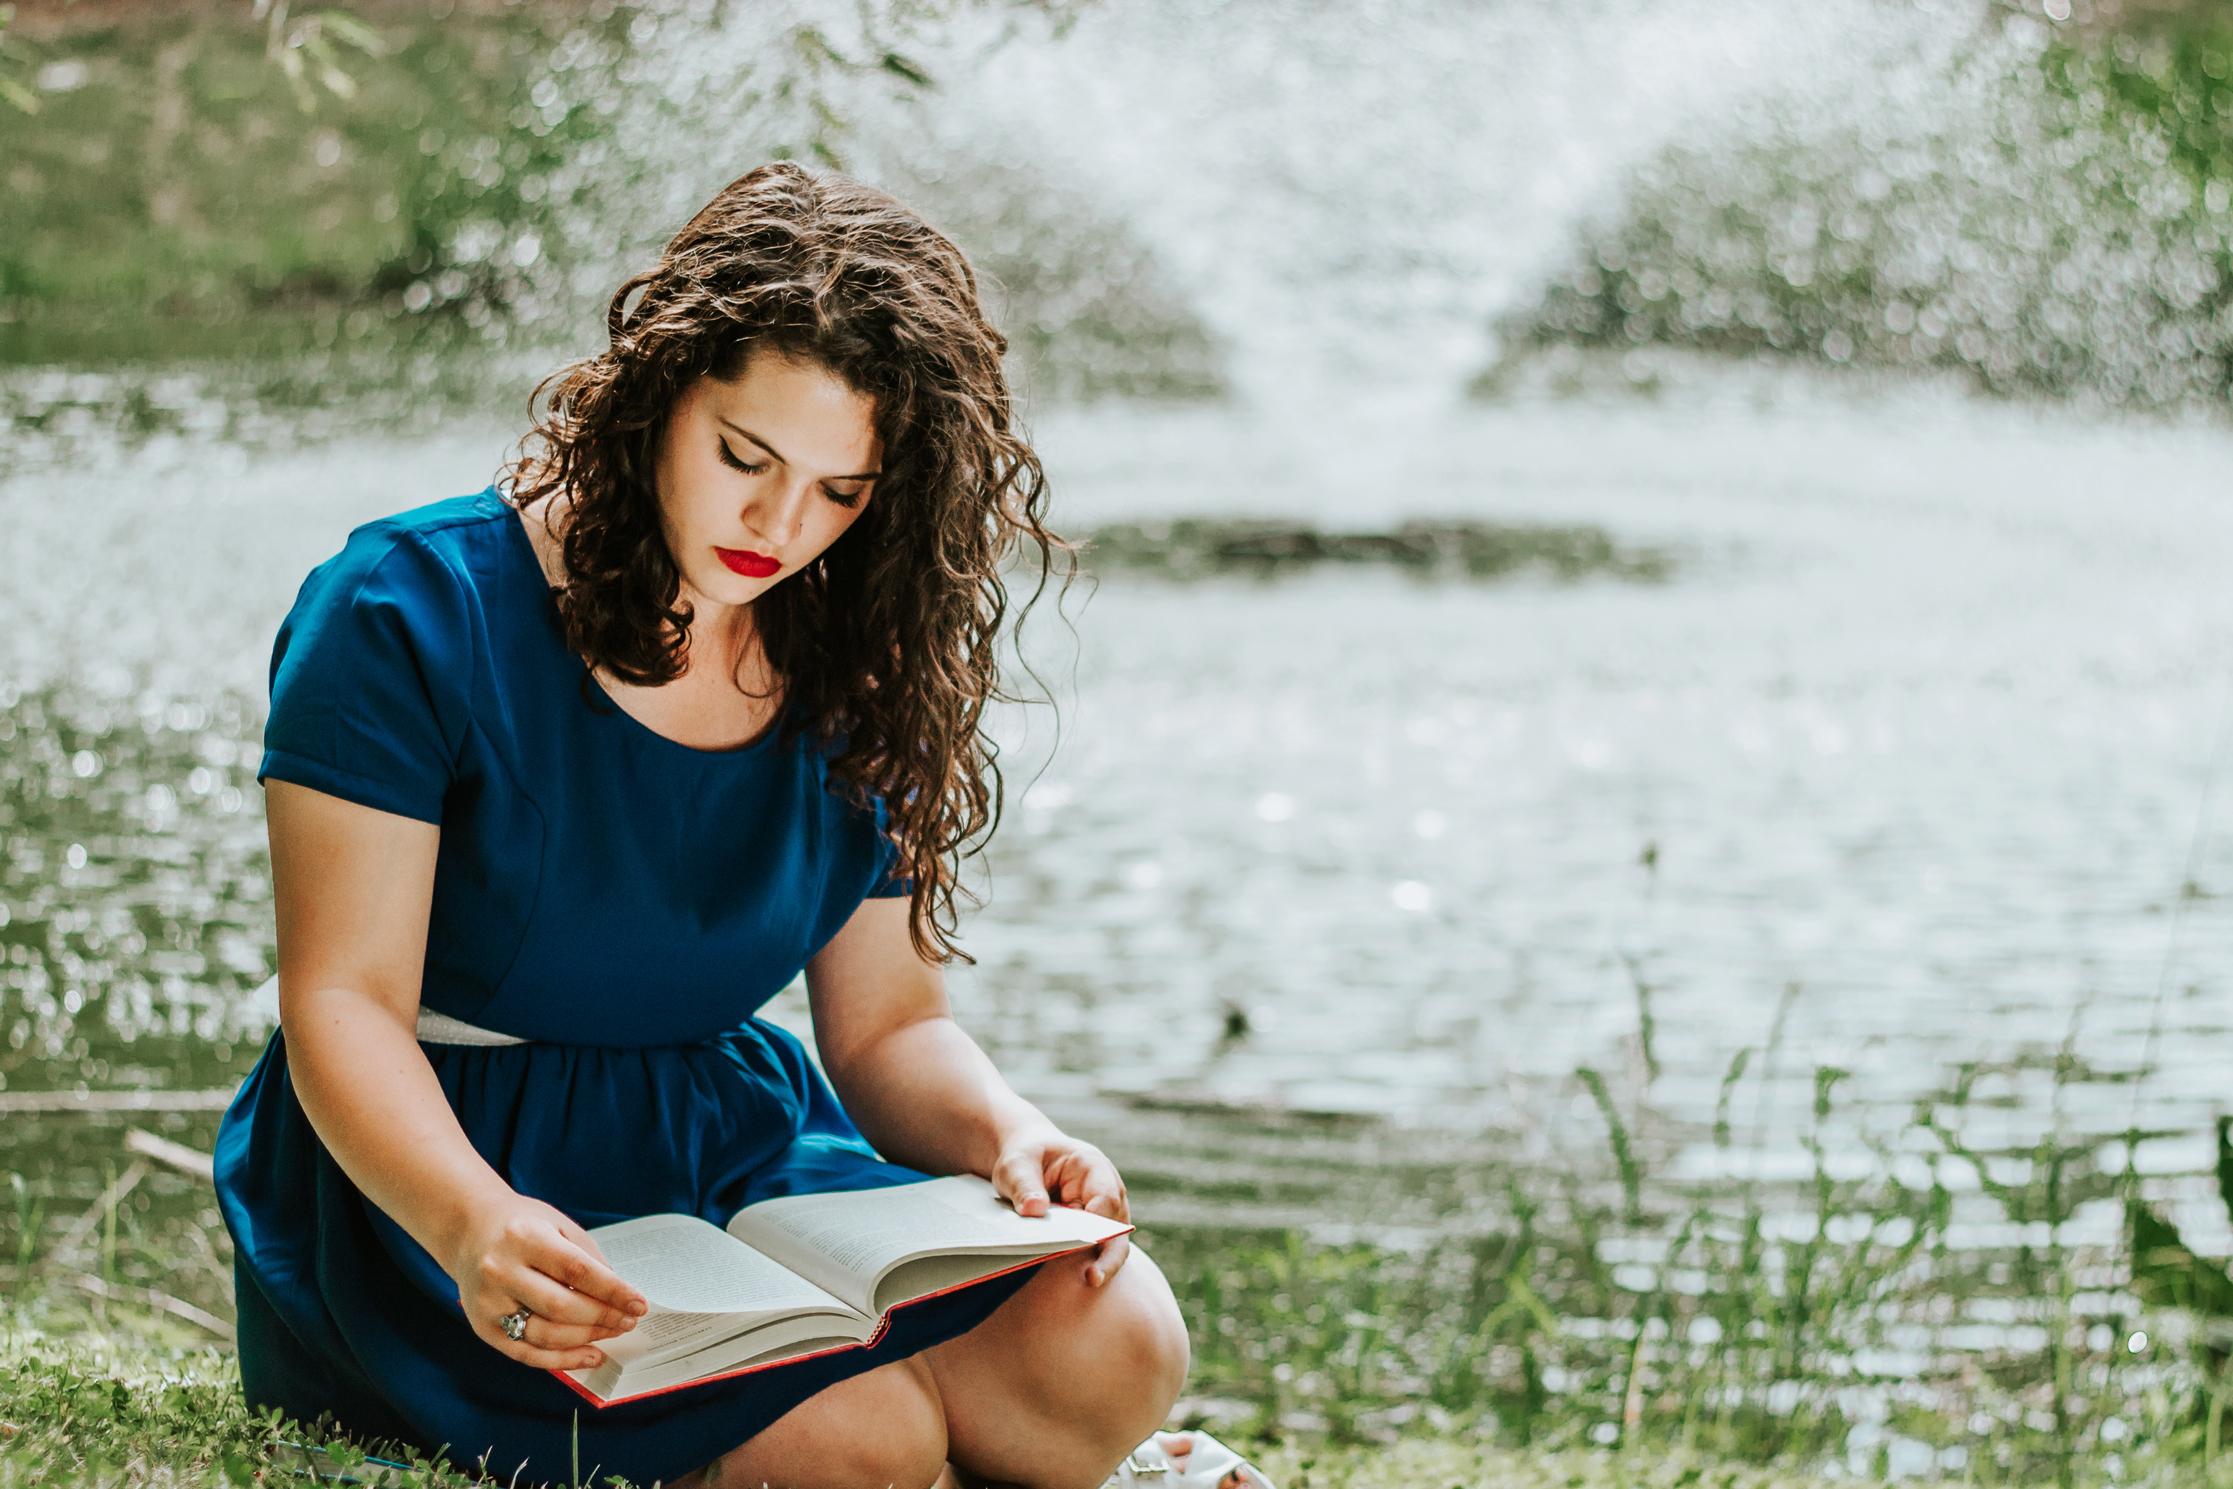 Belle-Styled-Shoot-Reading-Fountain-Beauty-Beast